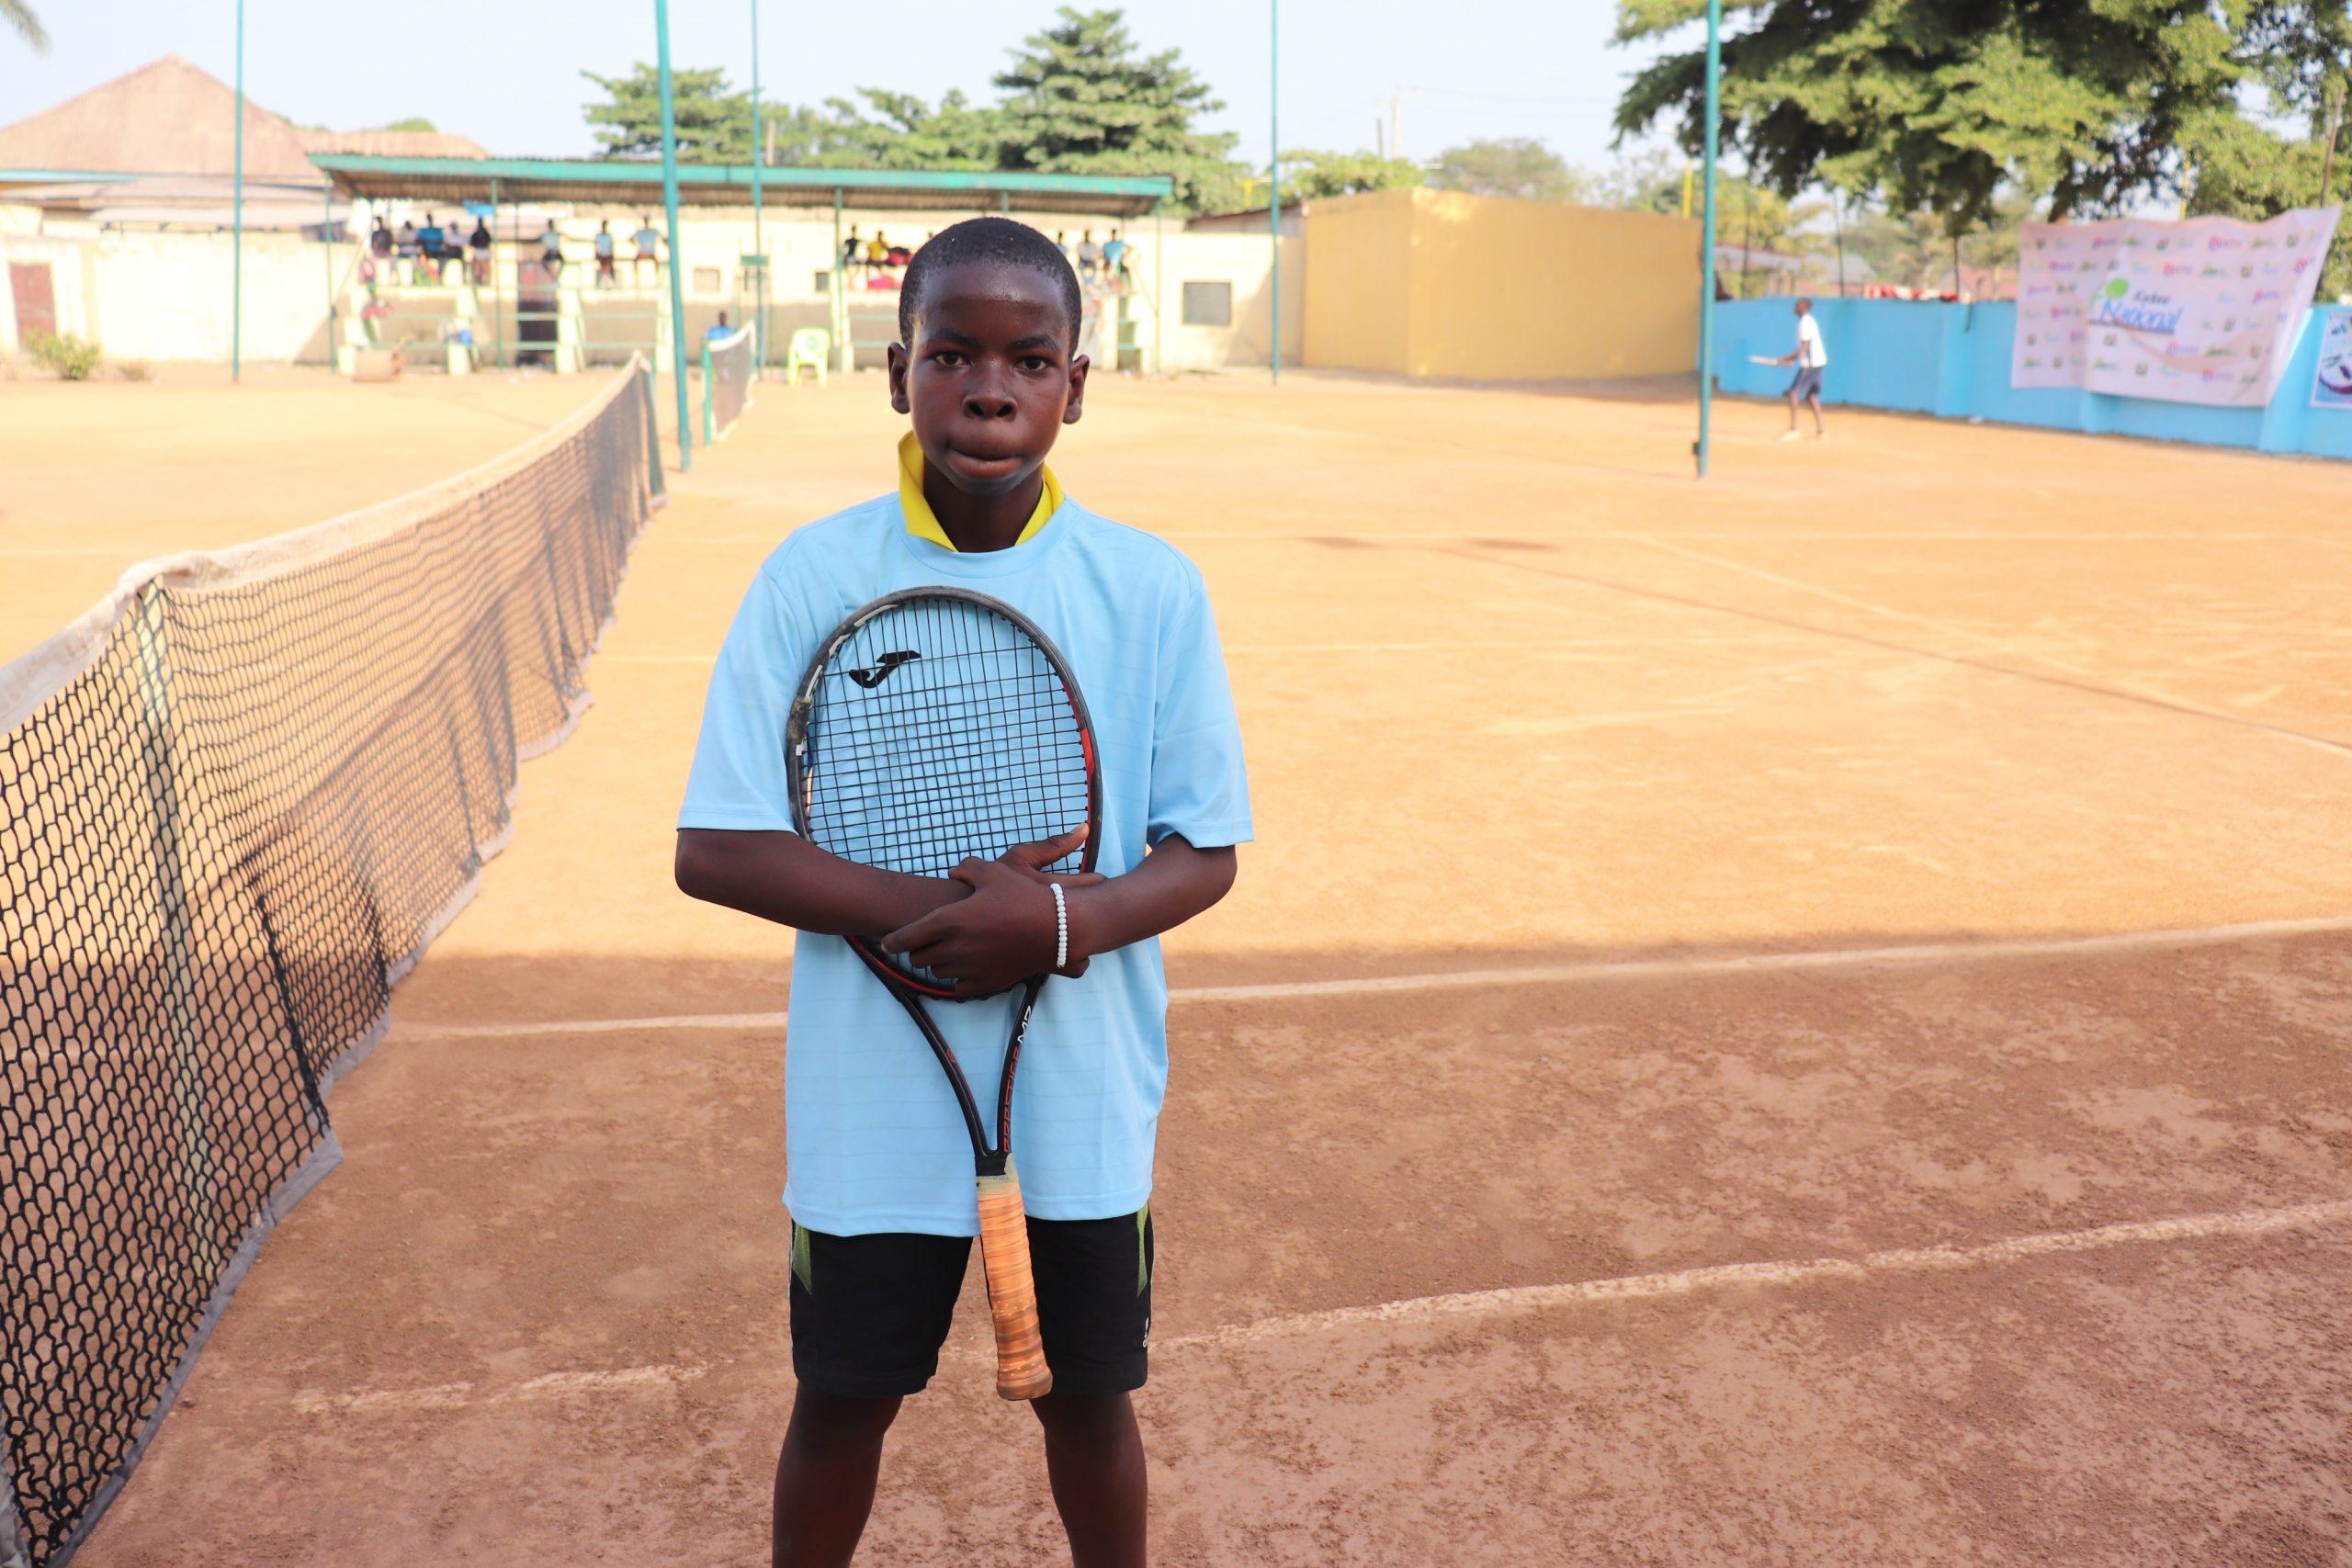 Kaduna Clay Court: Action begins as Players battle for Glory in Kaduna